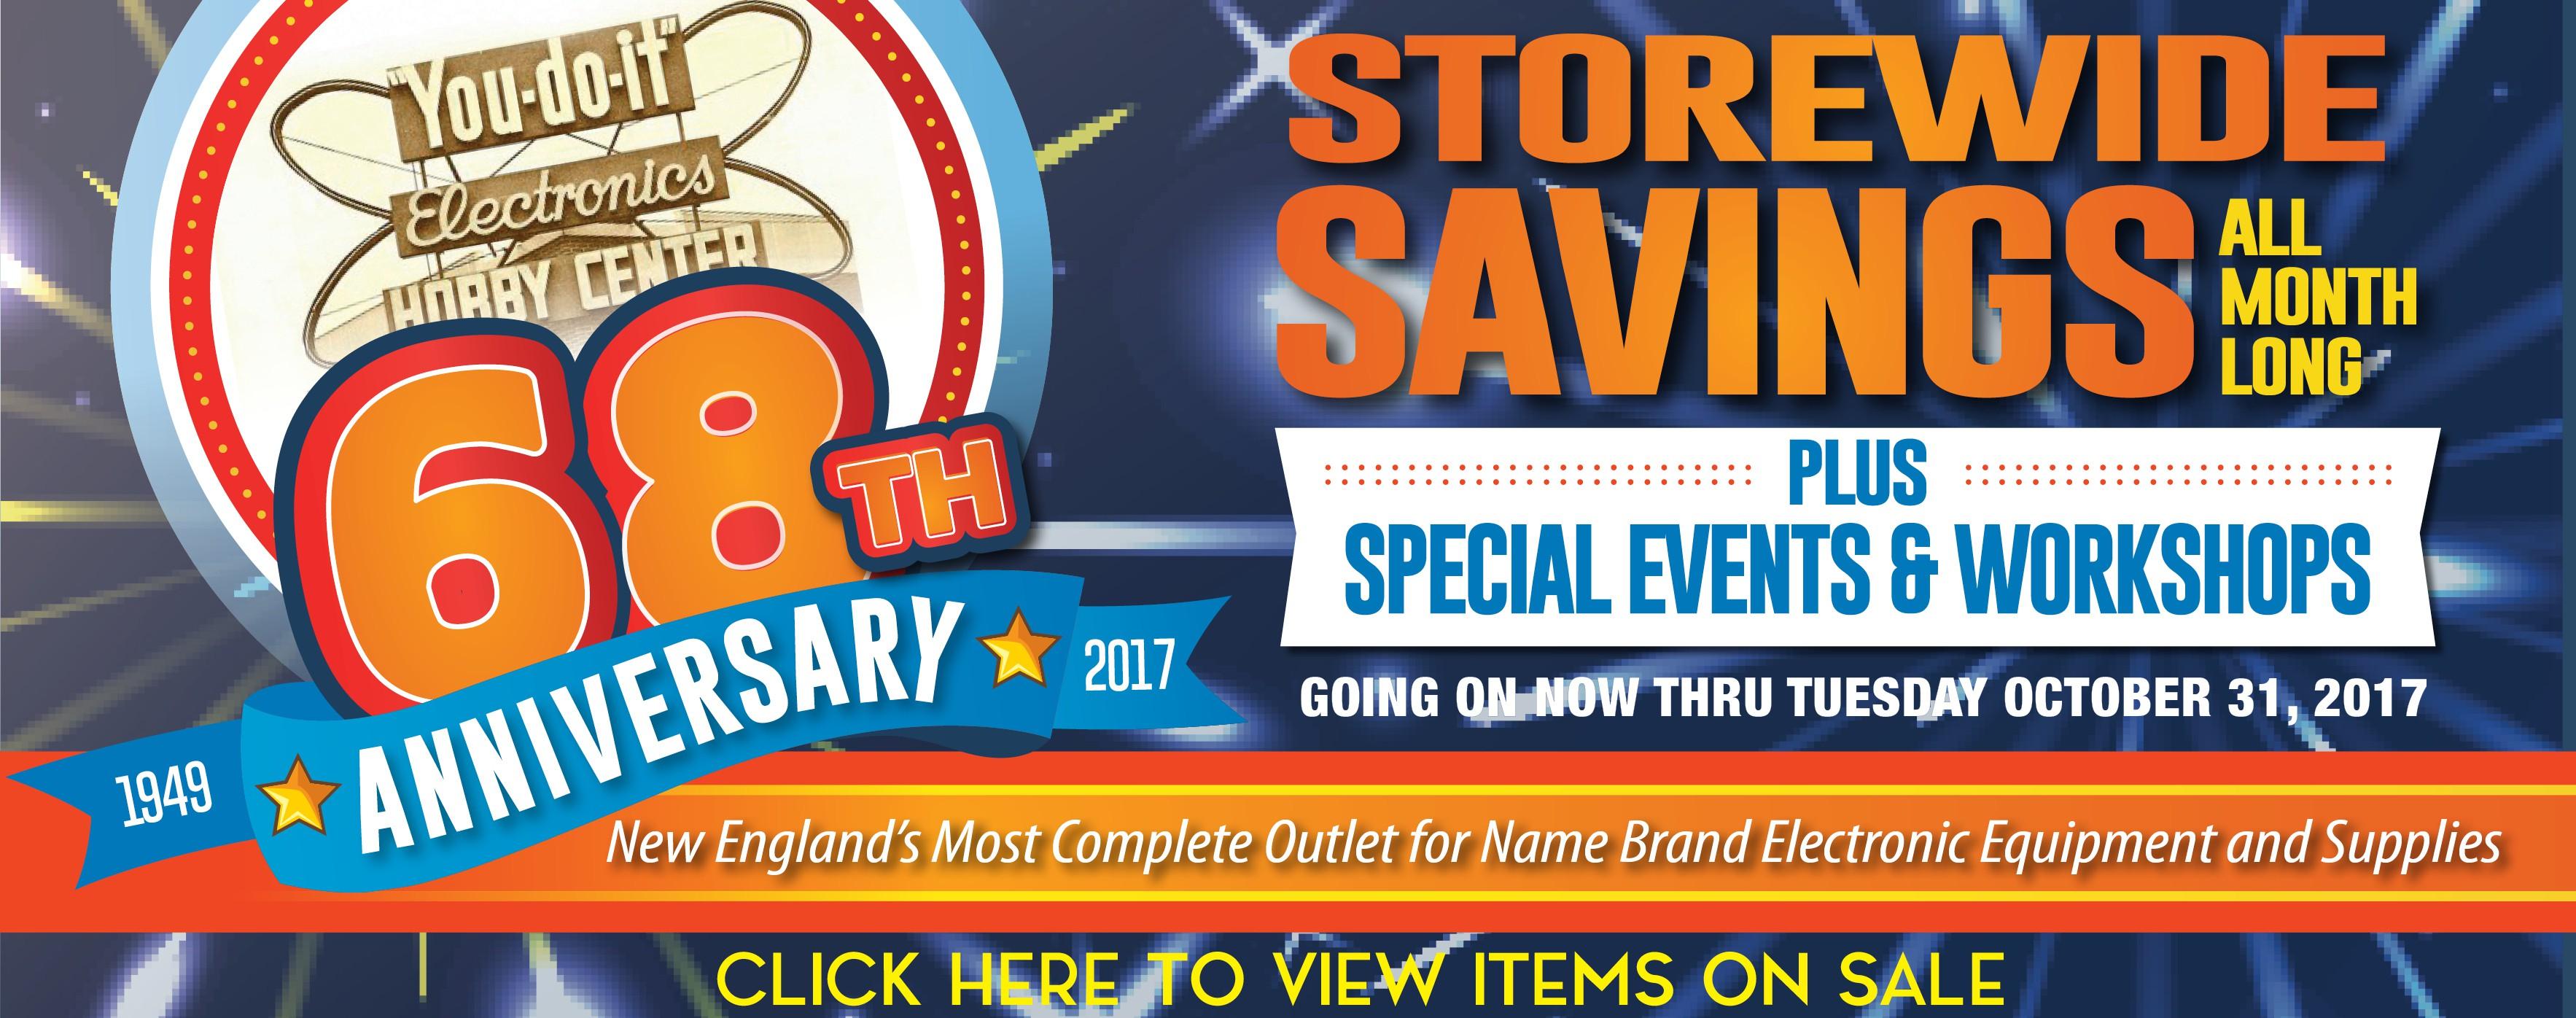 Anniversary Sale Oct 2017